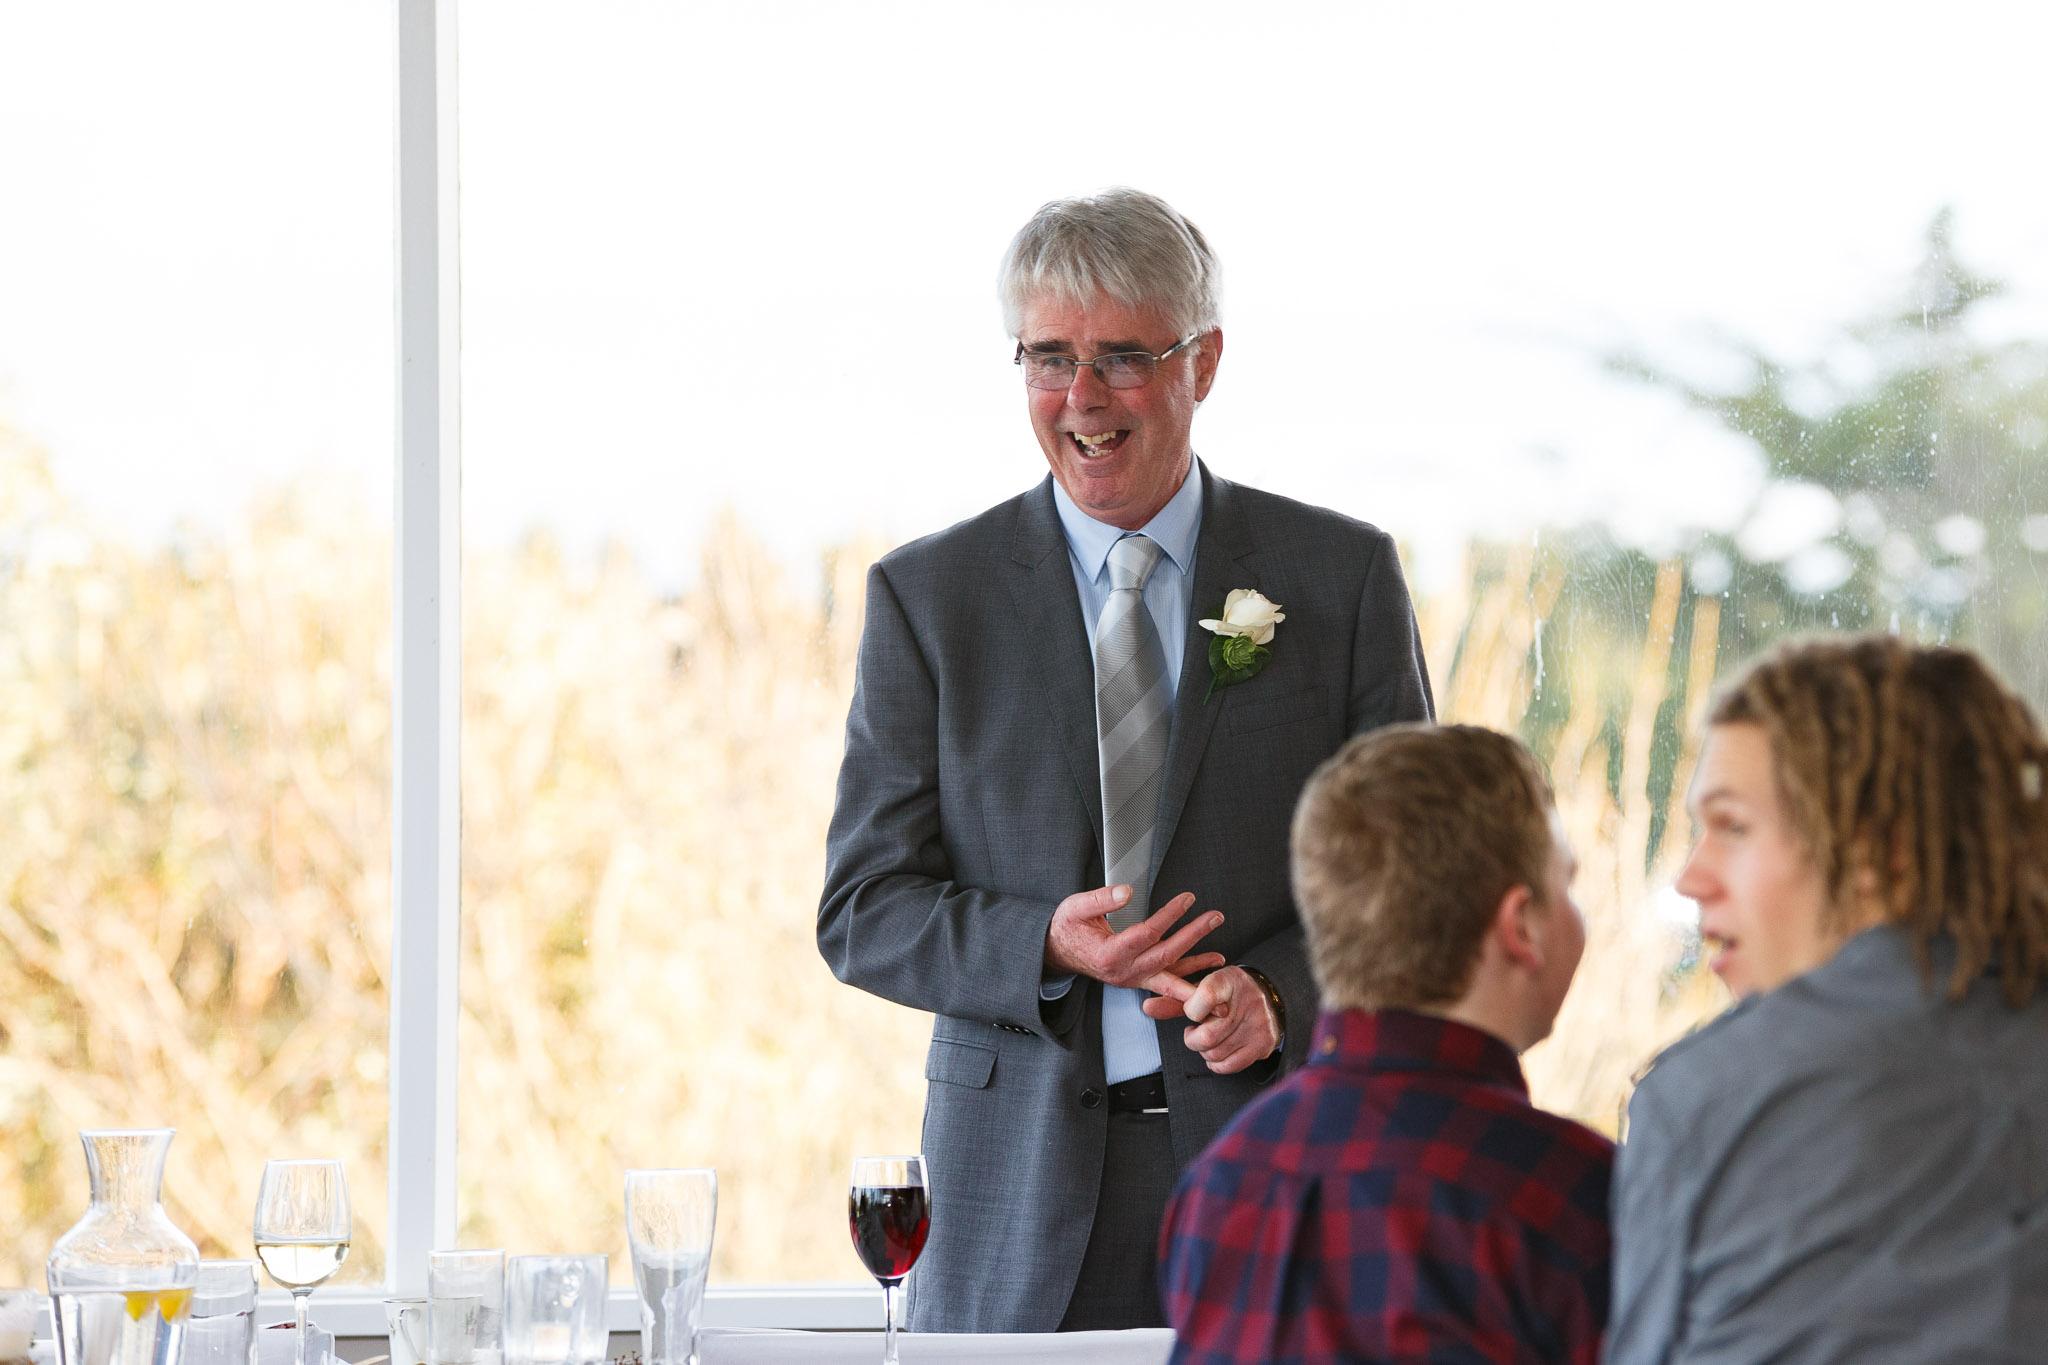 highlight_wedding_photography_manawatu_palmerston_north_new_zealand_rangitikei_golf_ohakea-77.jpg